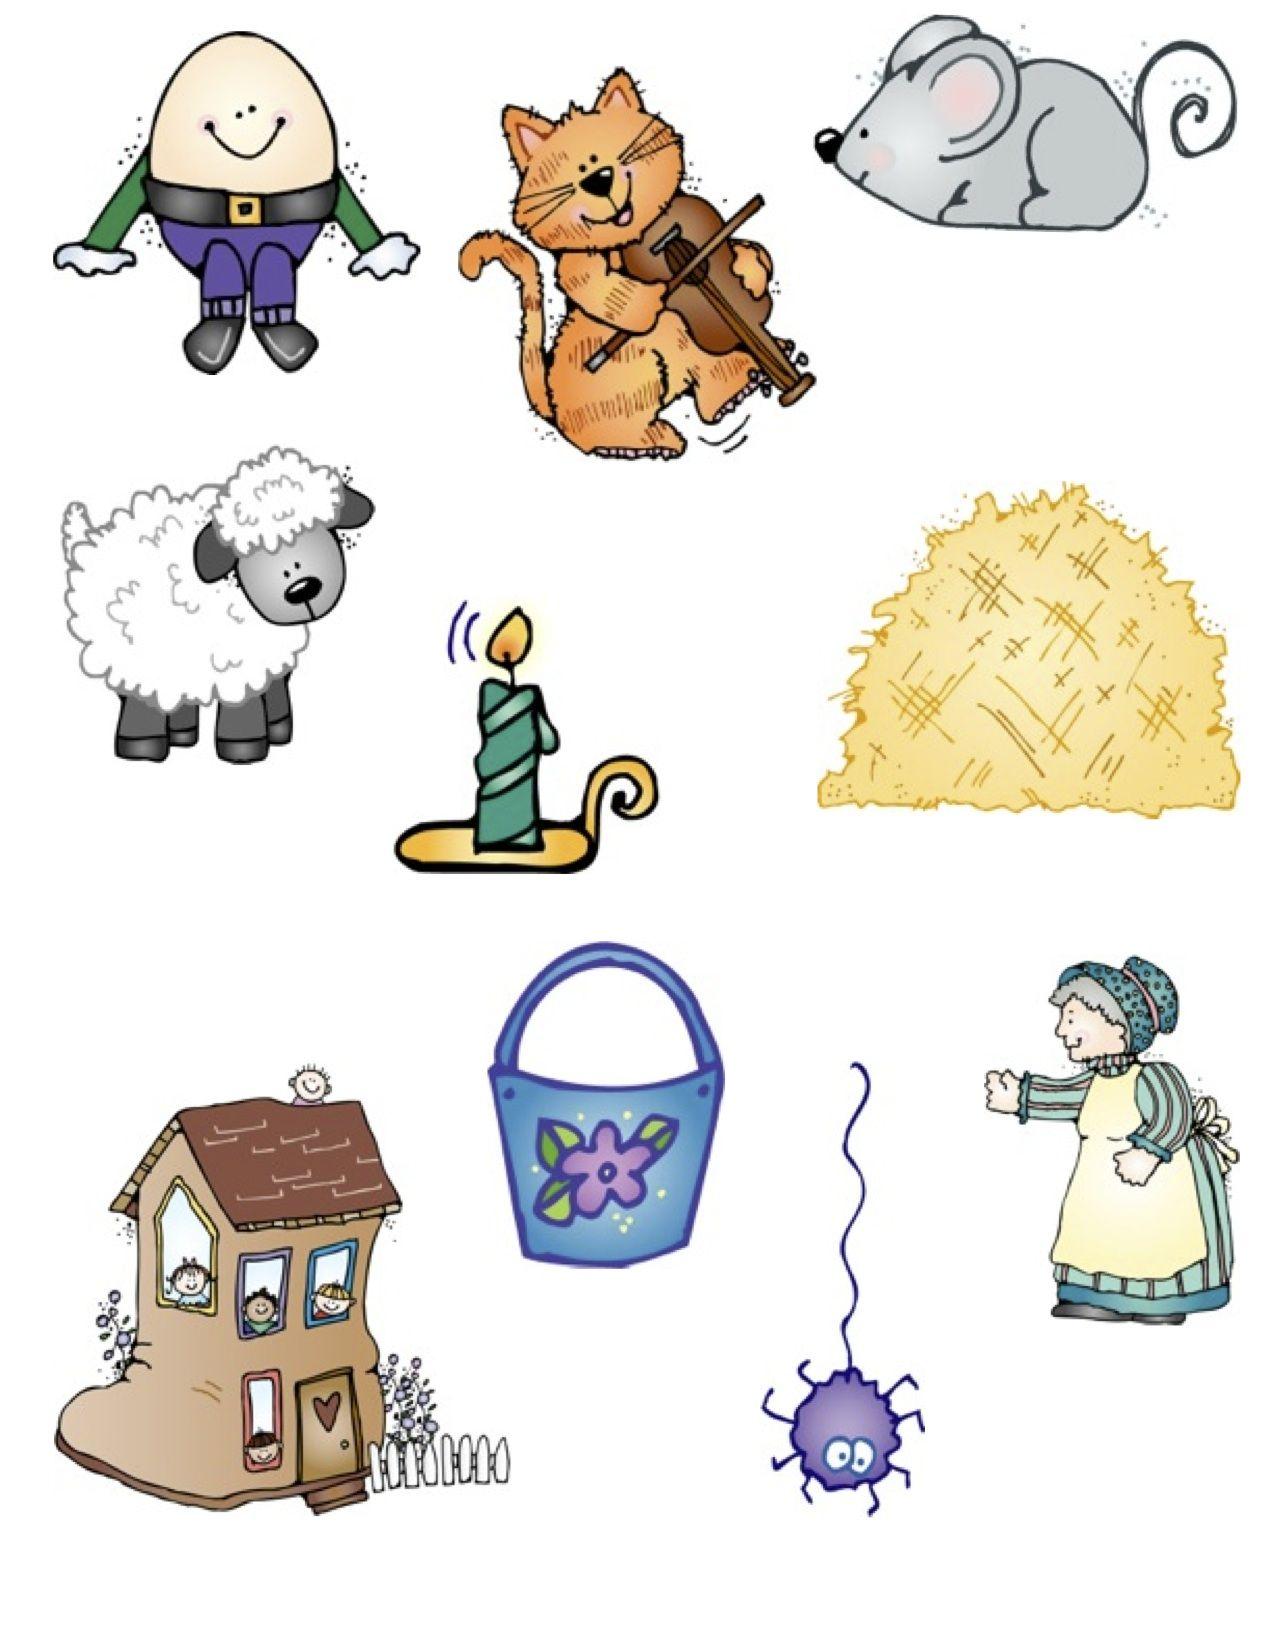 More Fun With Nursery Rhymes